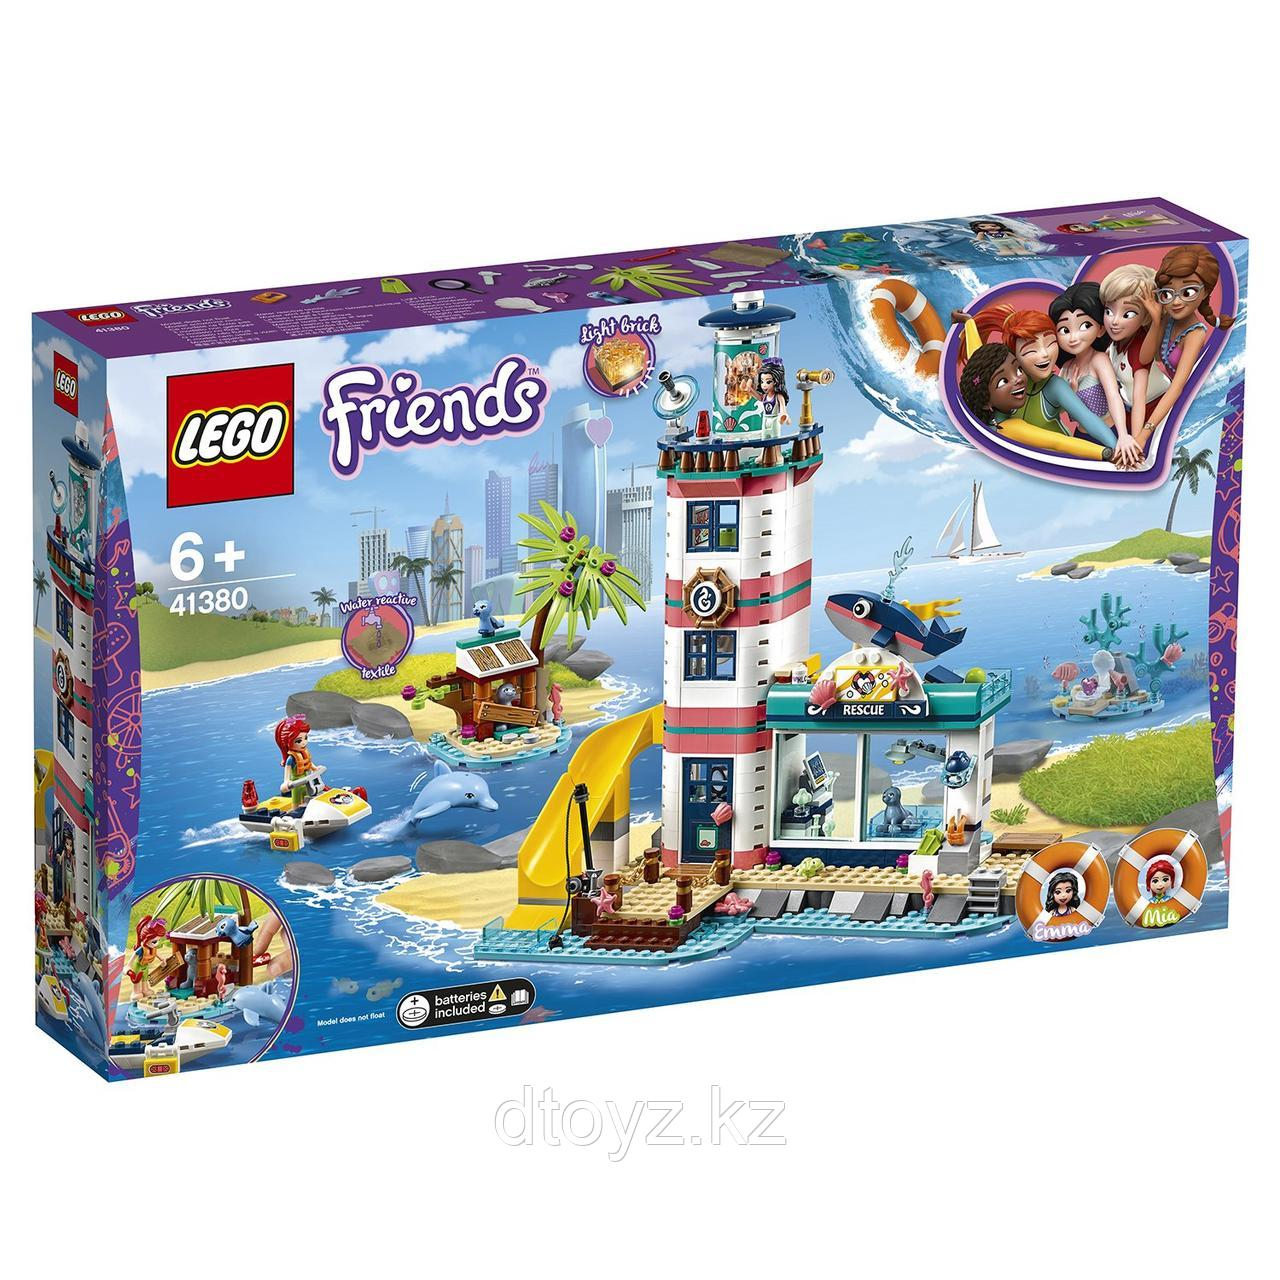 Lego Friends 41380 Спасательный центр на маяке